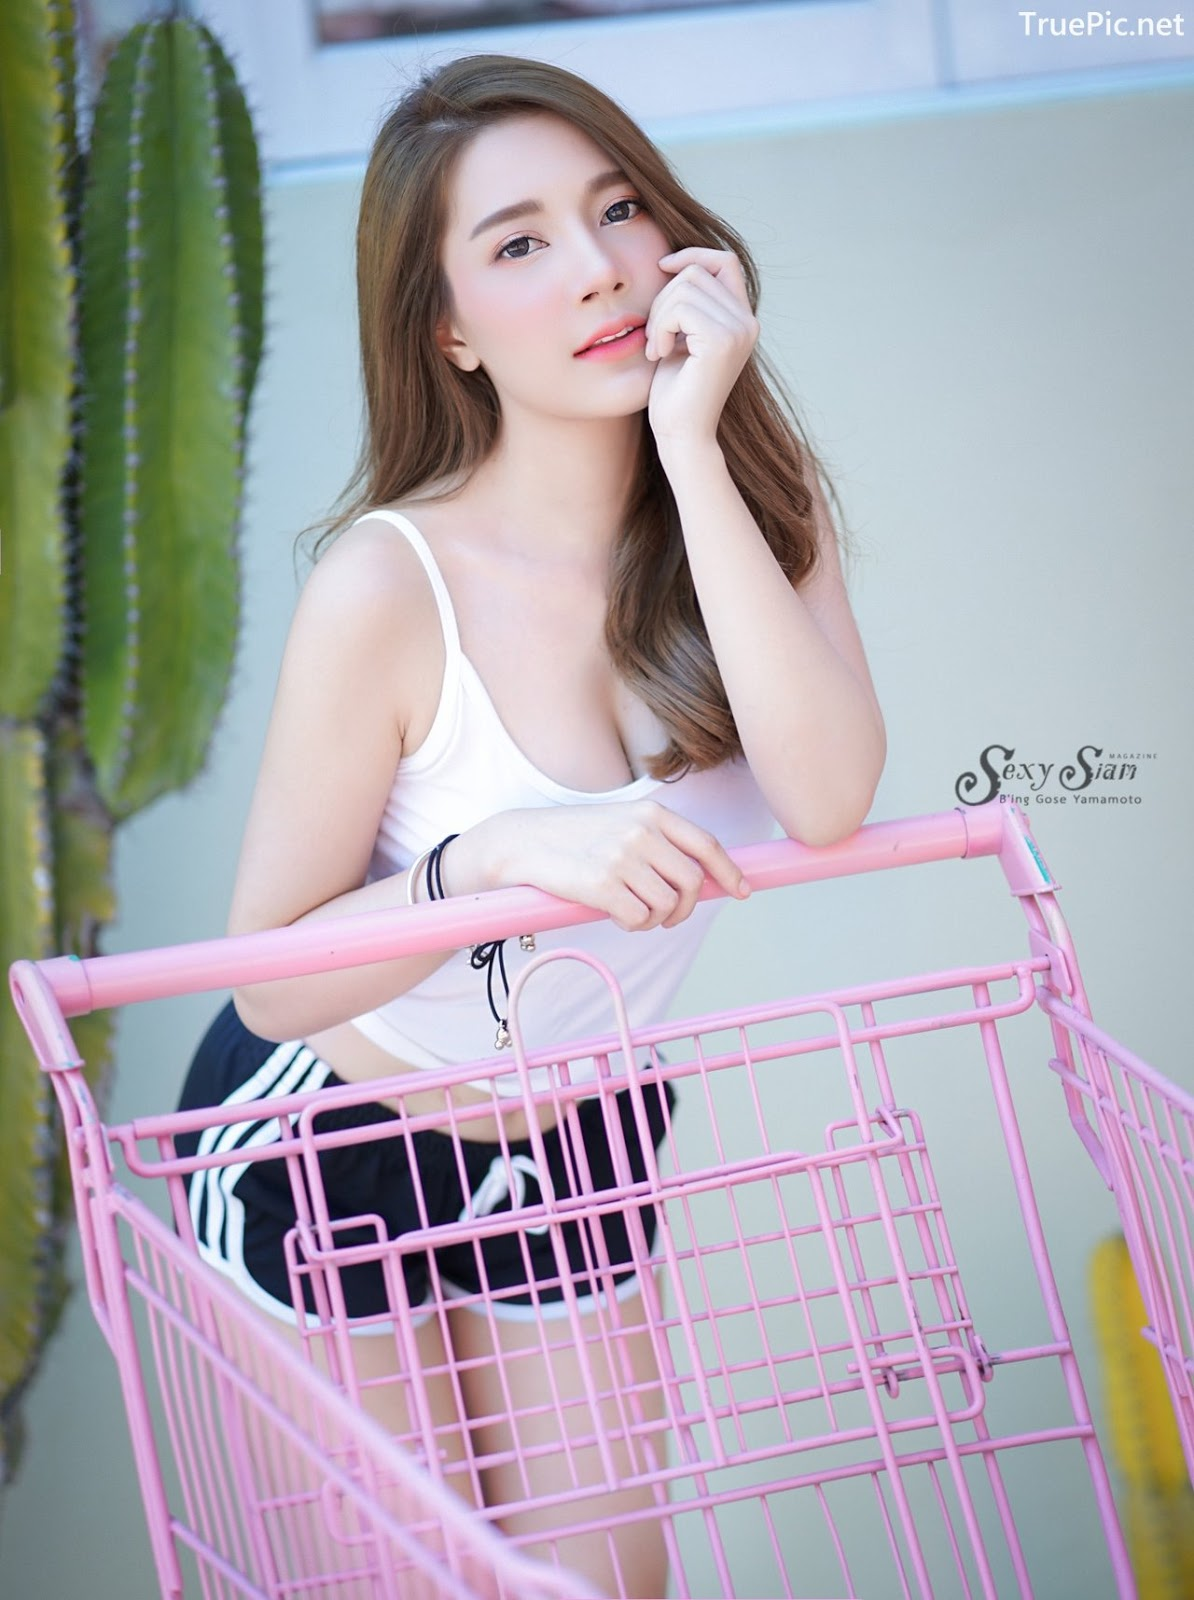 Image Thailand Model - Sasipa Tungmay Jibkrapong - White Crop Top - TruePic.net - Picture-10